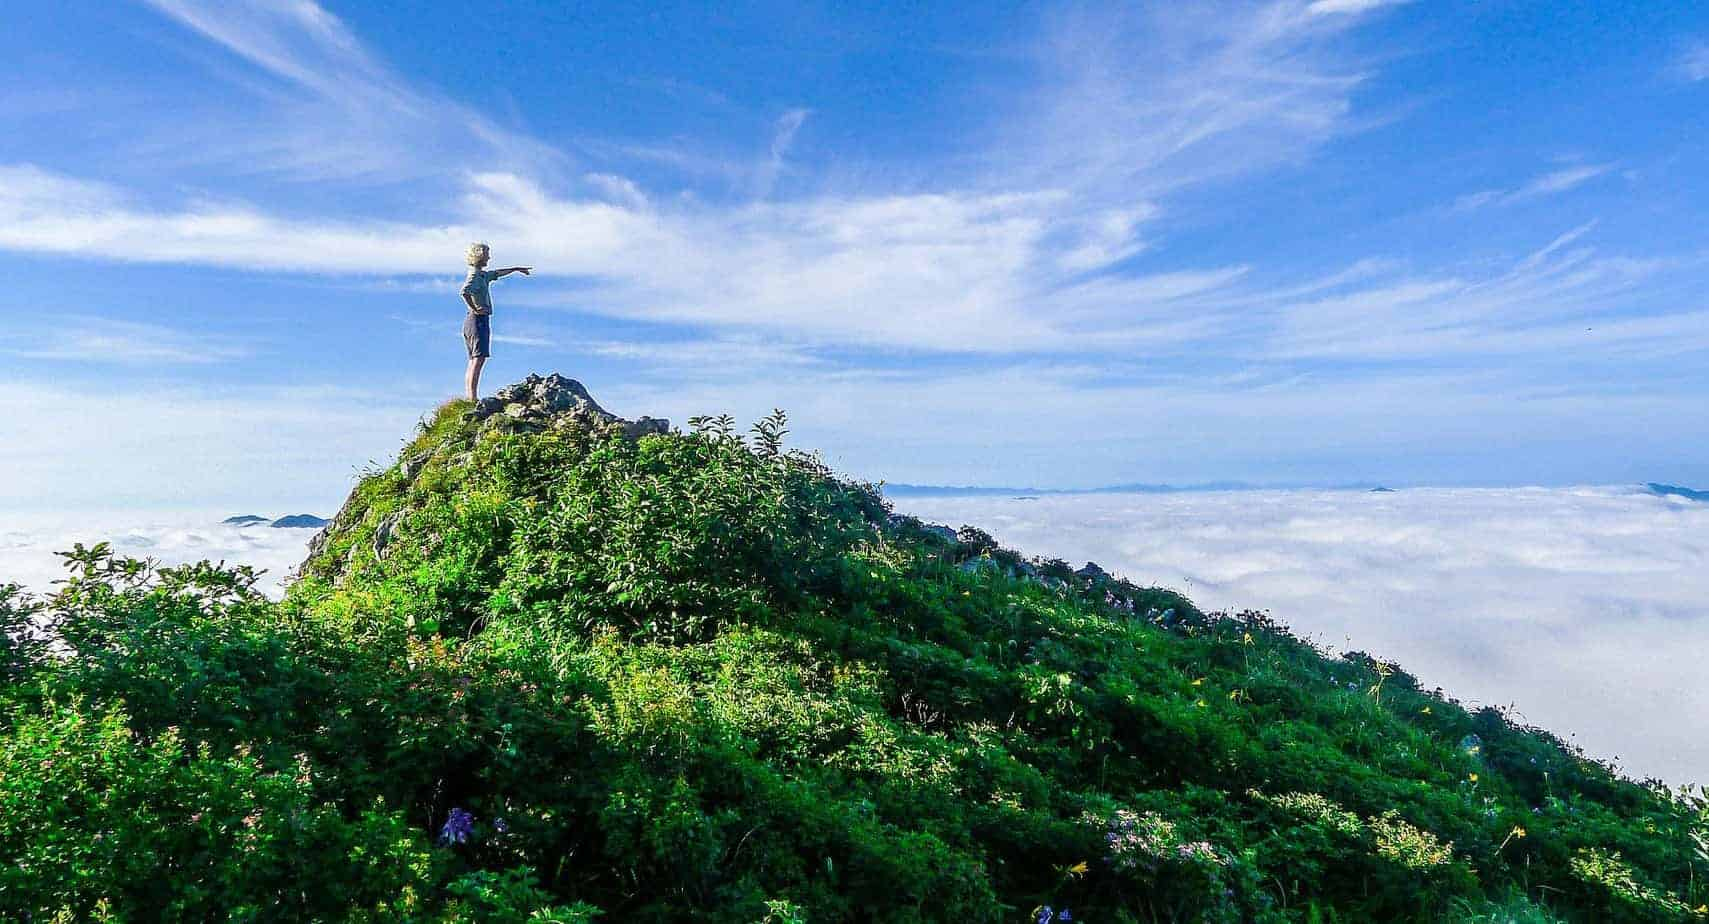 Beyond the Truck: Hiking 465 Miles of the Baekdu Daegan Trail (South Korea)